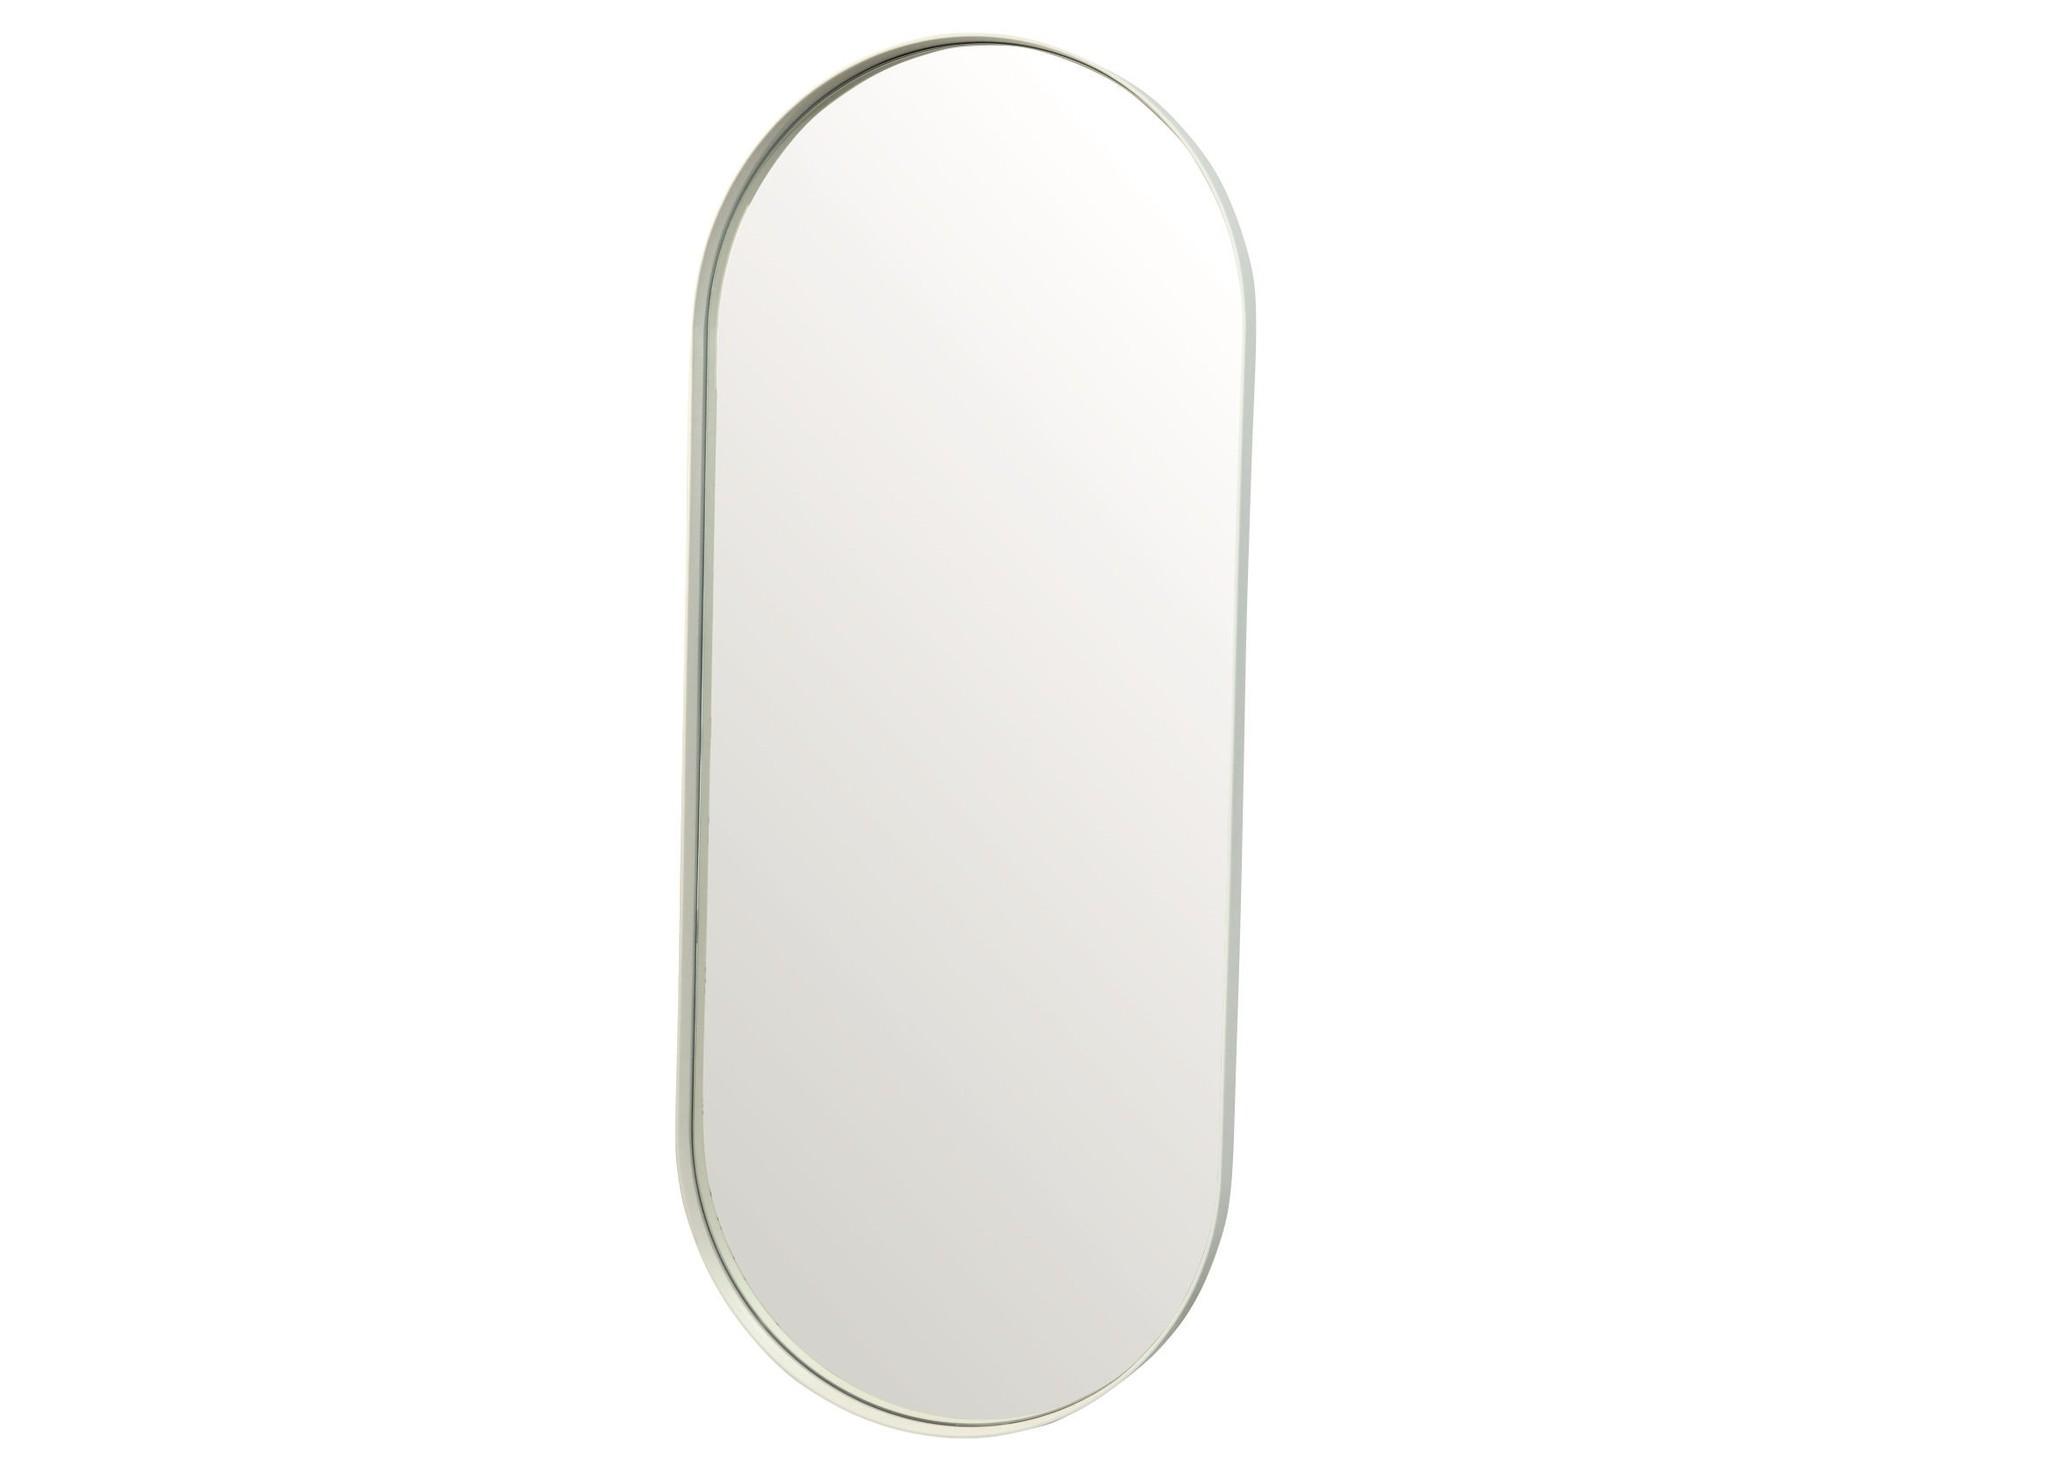 Настенное зеркало ванда 120*50 (simple mirror) белый 50x120x4 см.